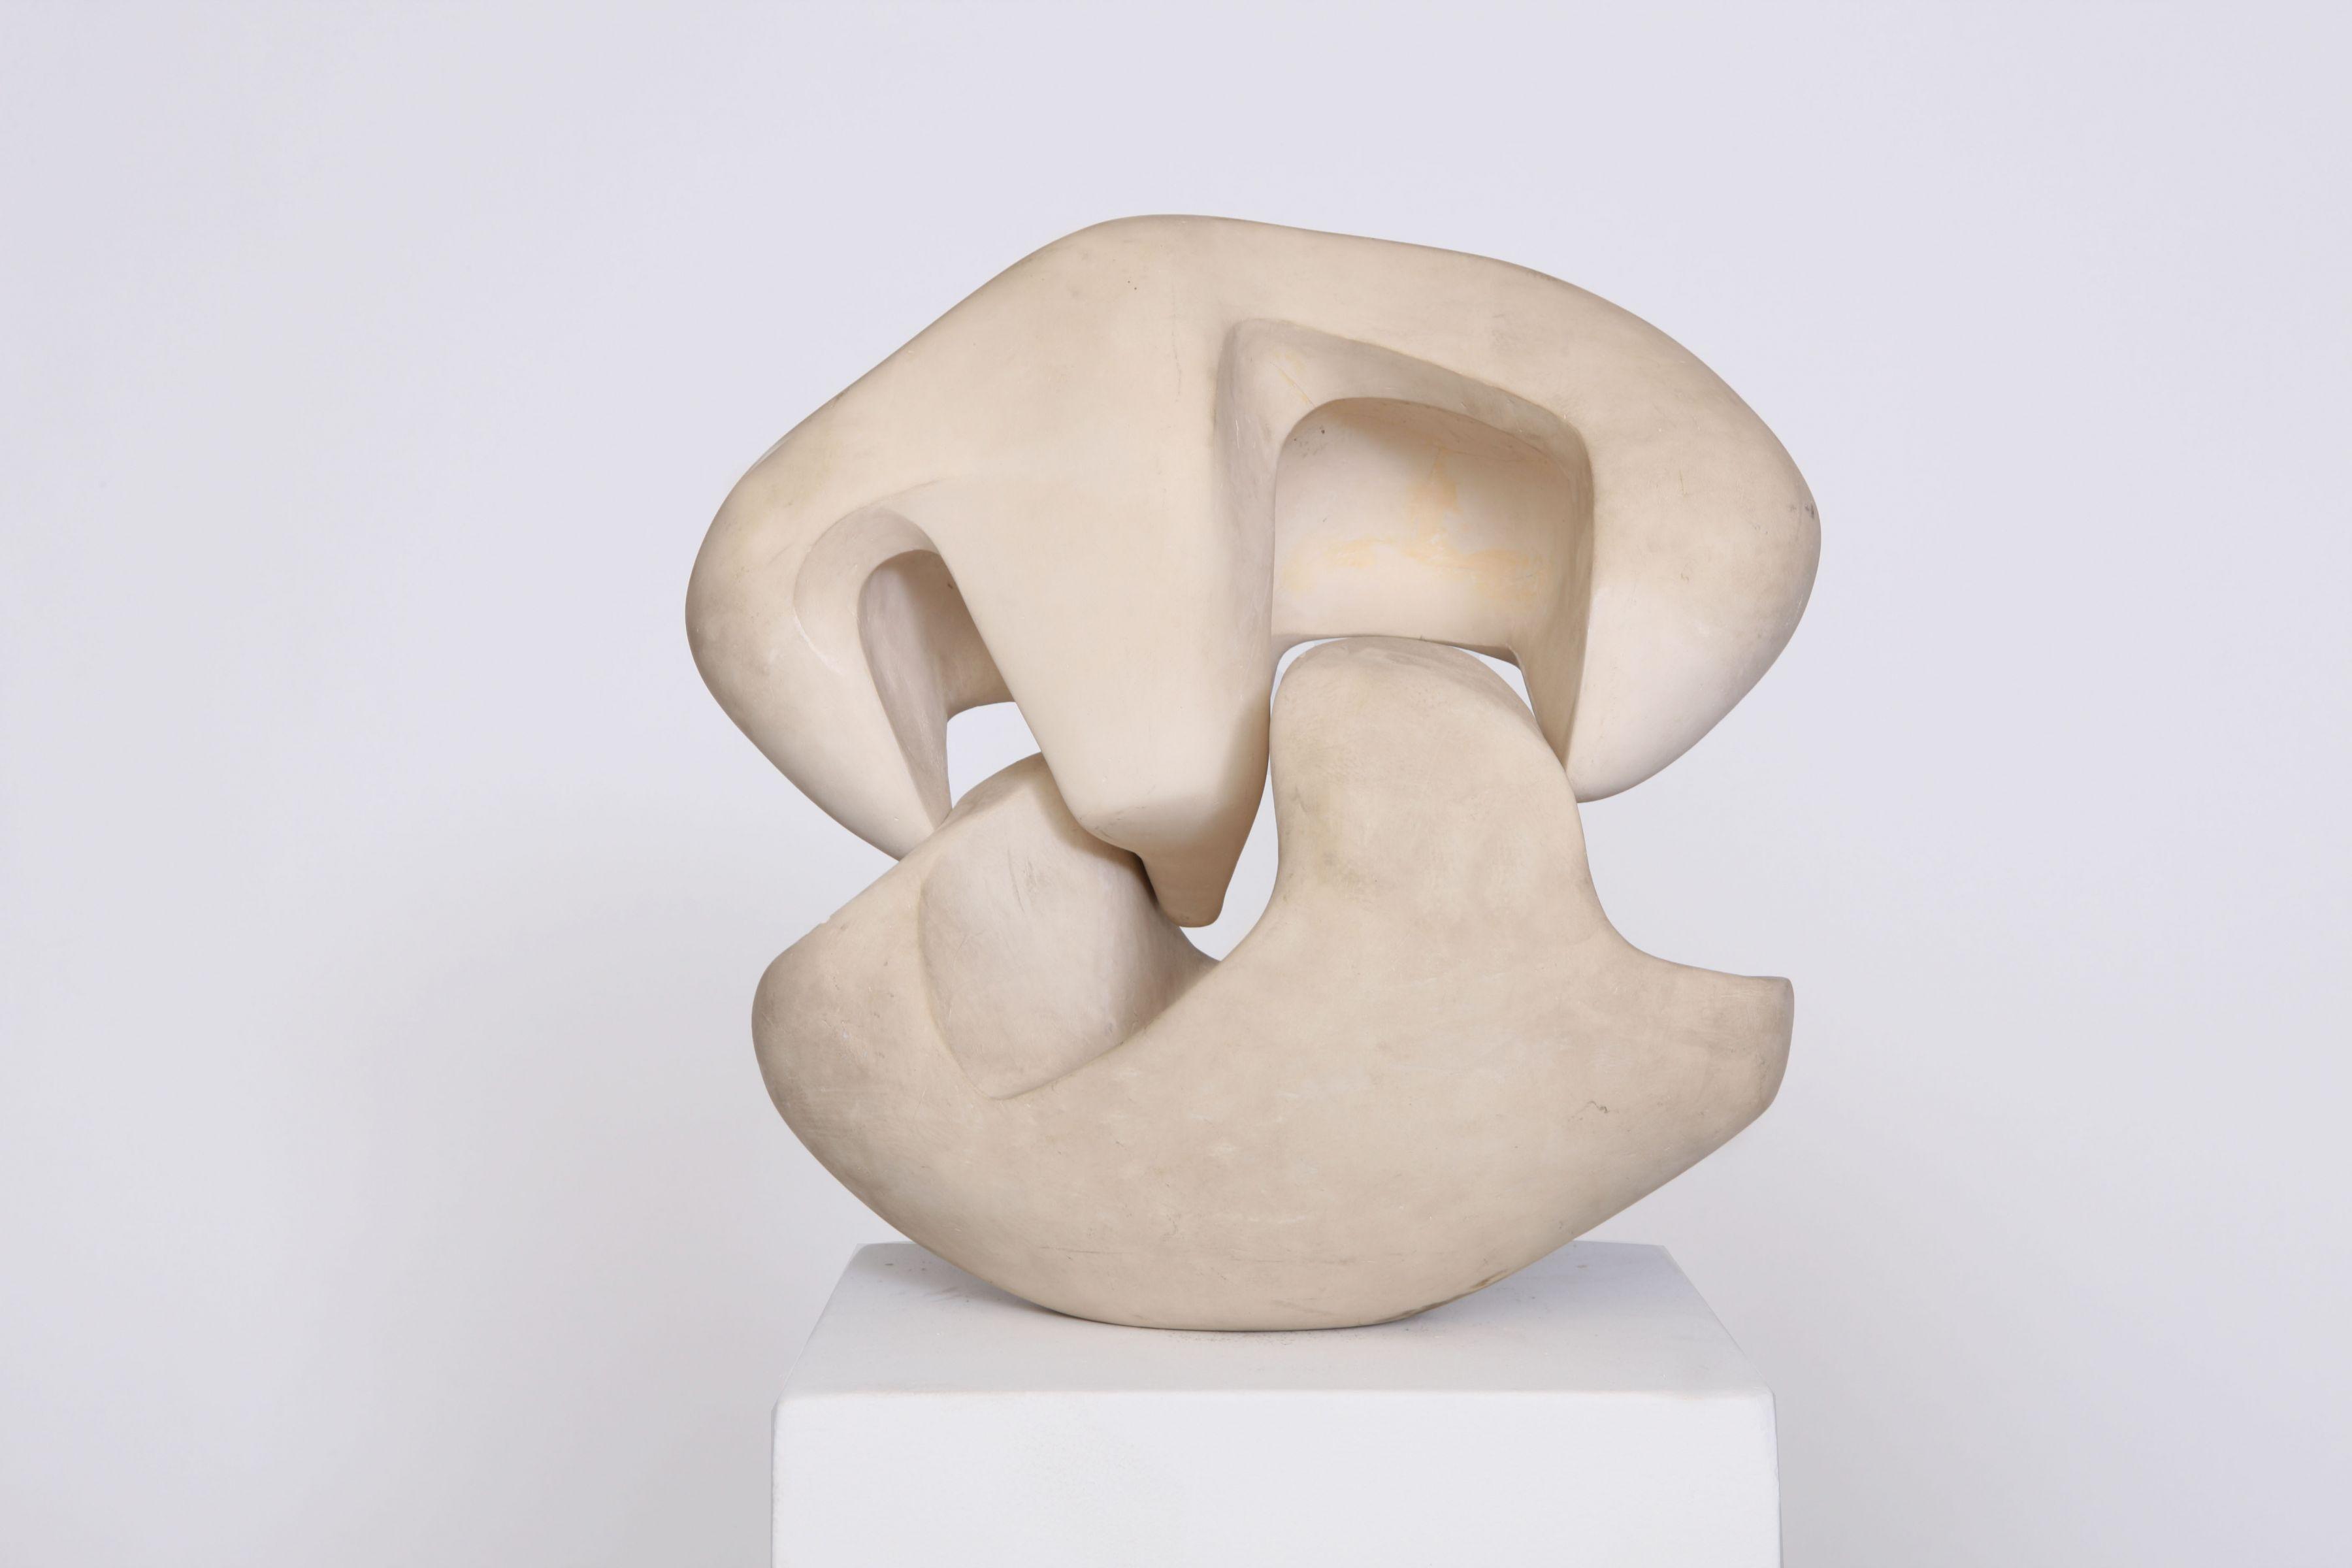 Sculpture by Marta Pan